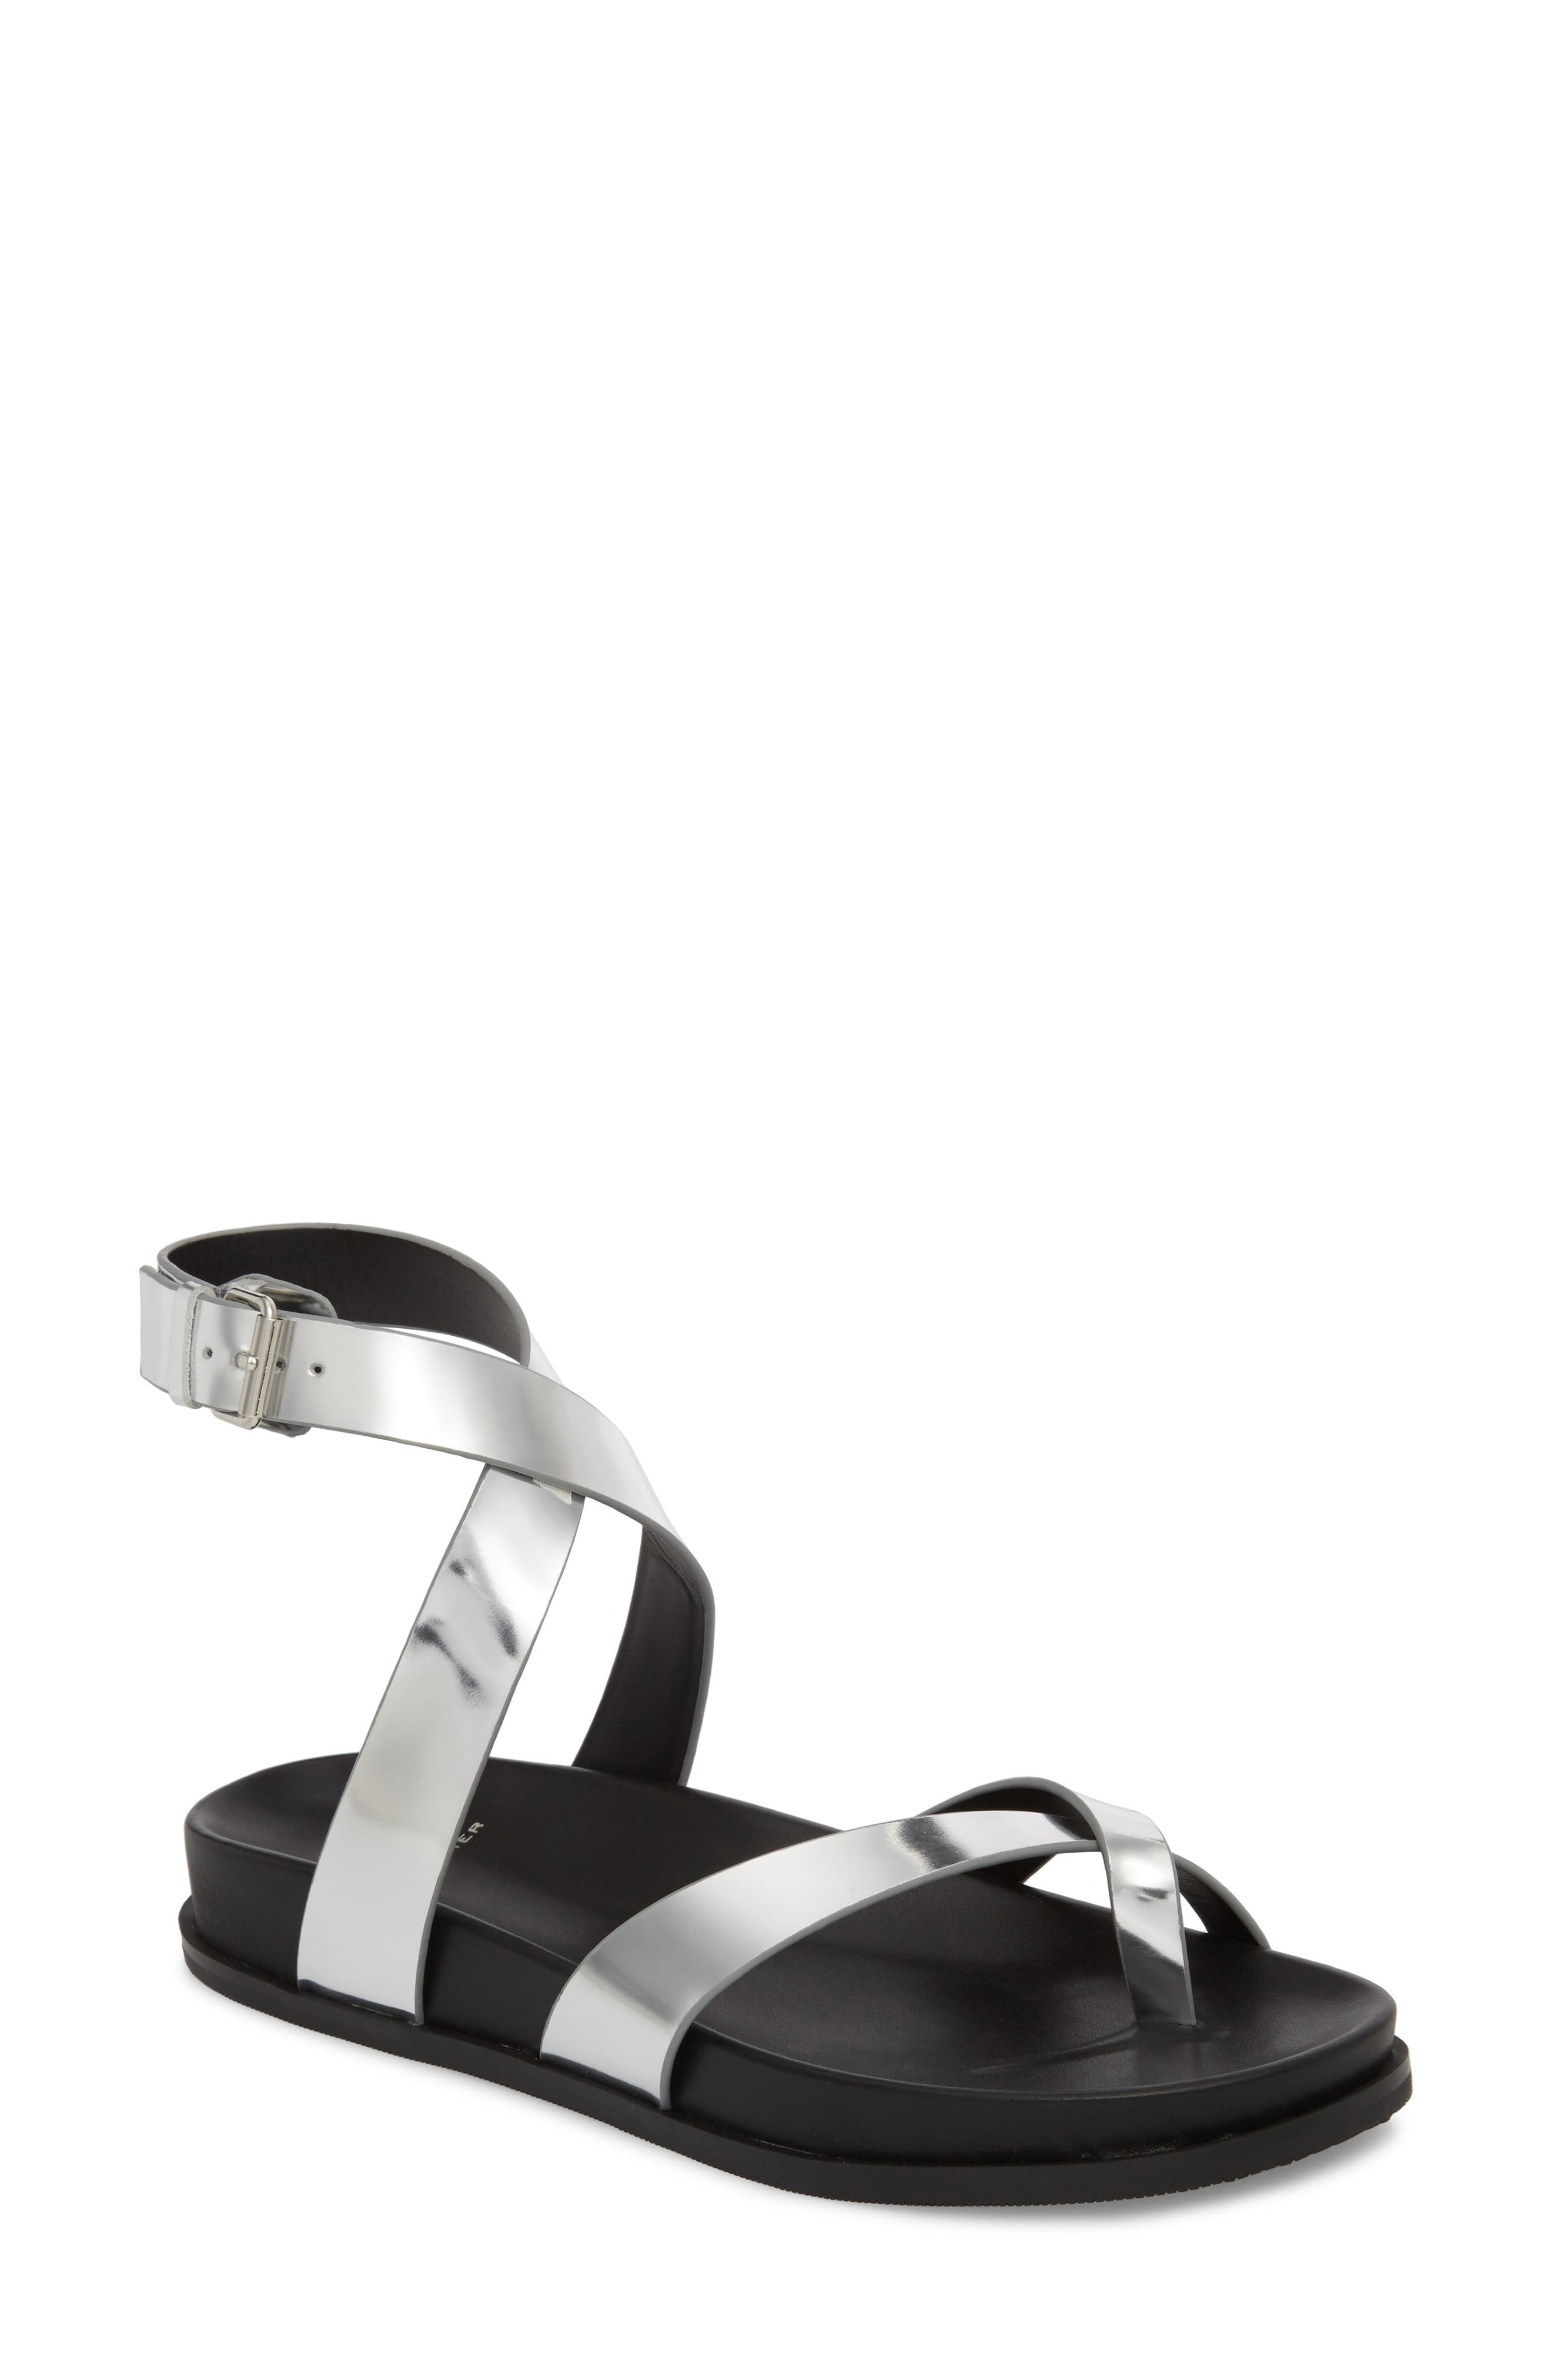 Yarina Sandal,                         Main,                         color, Silver Leather